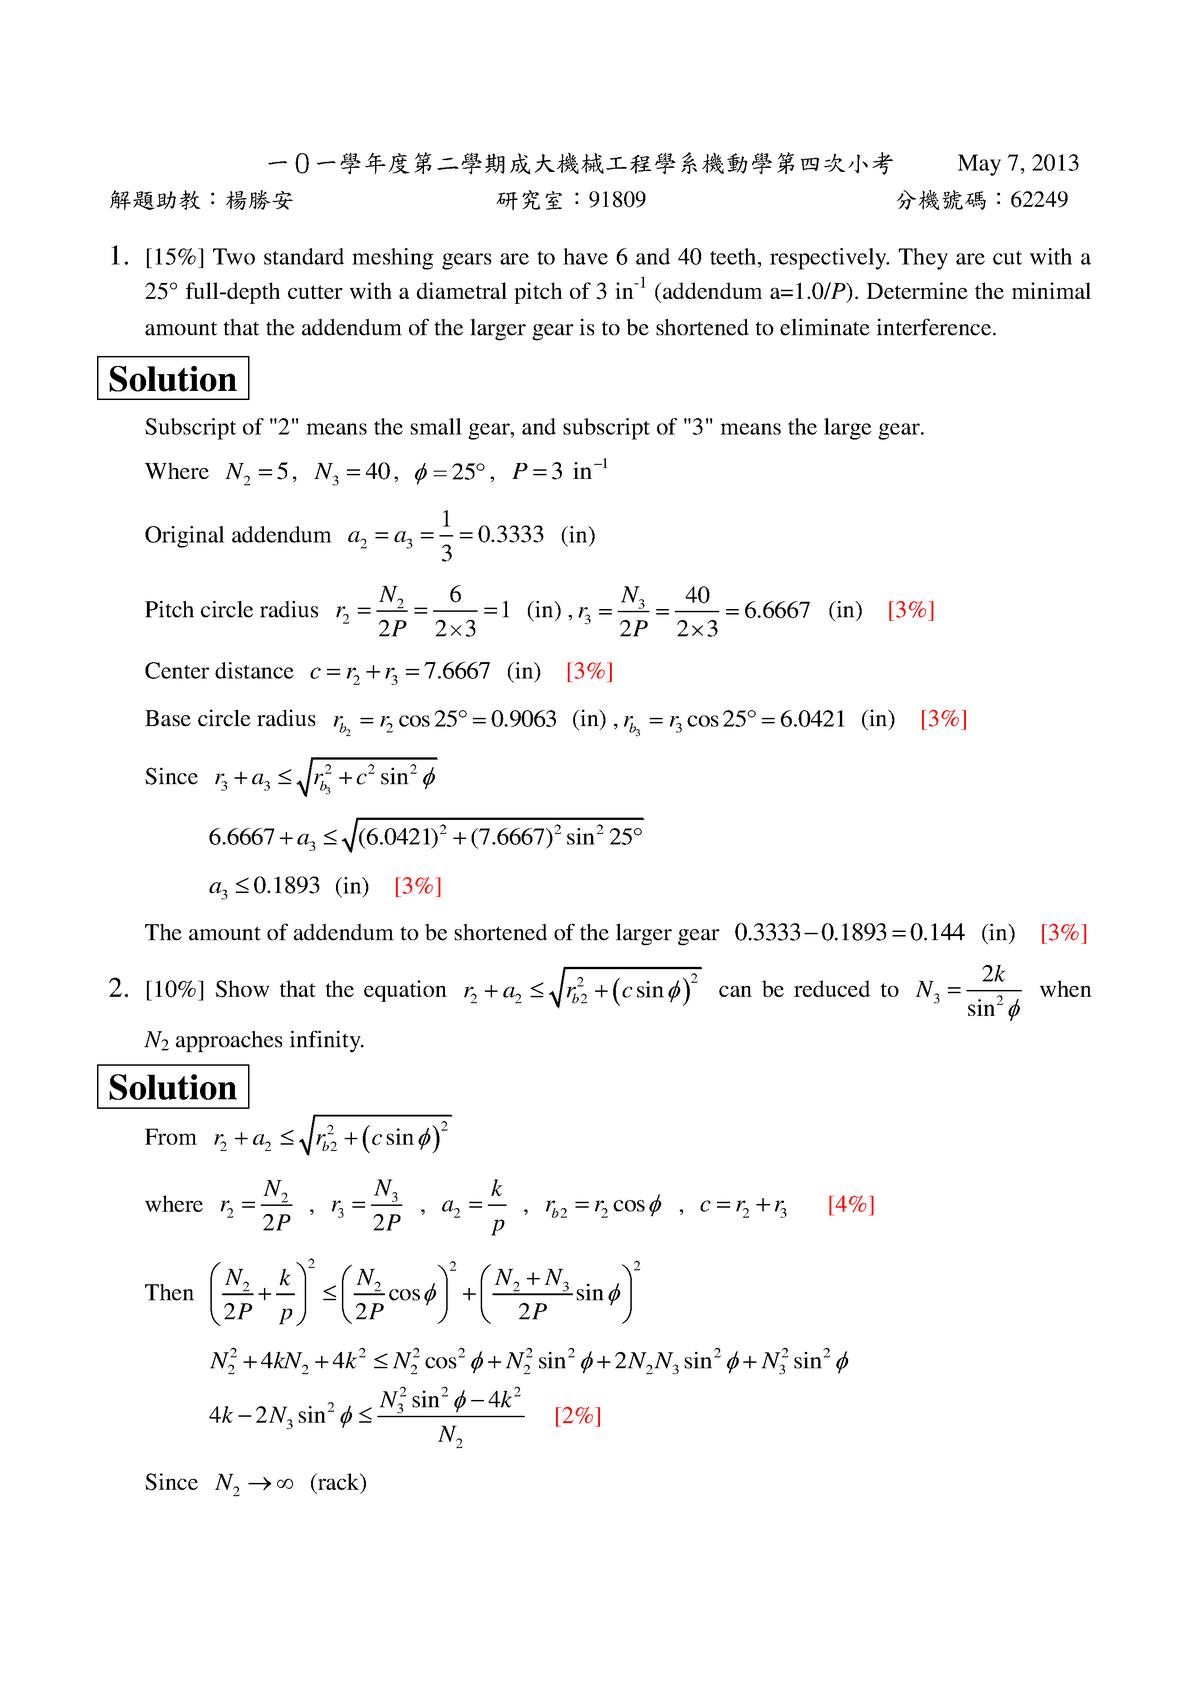 Exam 2013, questions and answers - Mechanism 2 E123020 - StuDocu